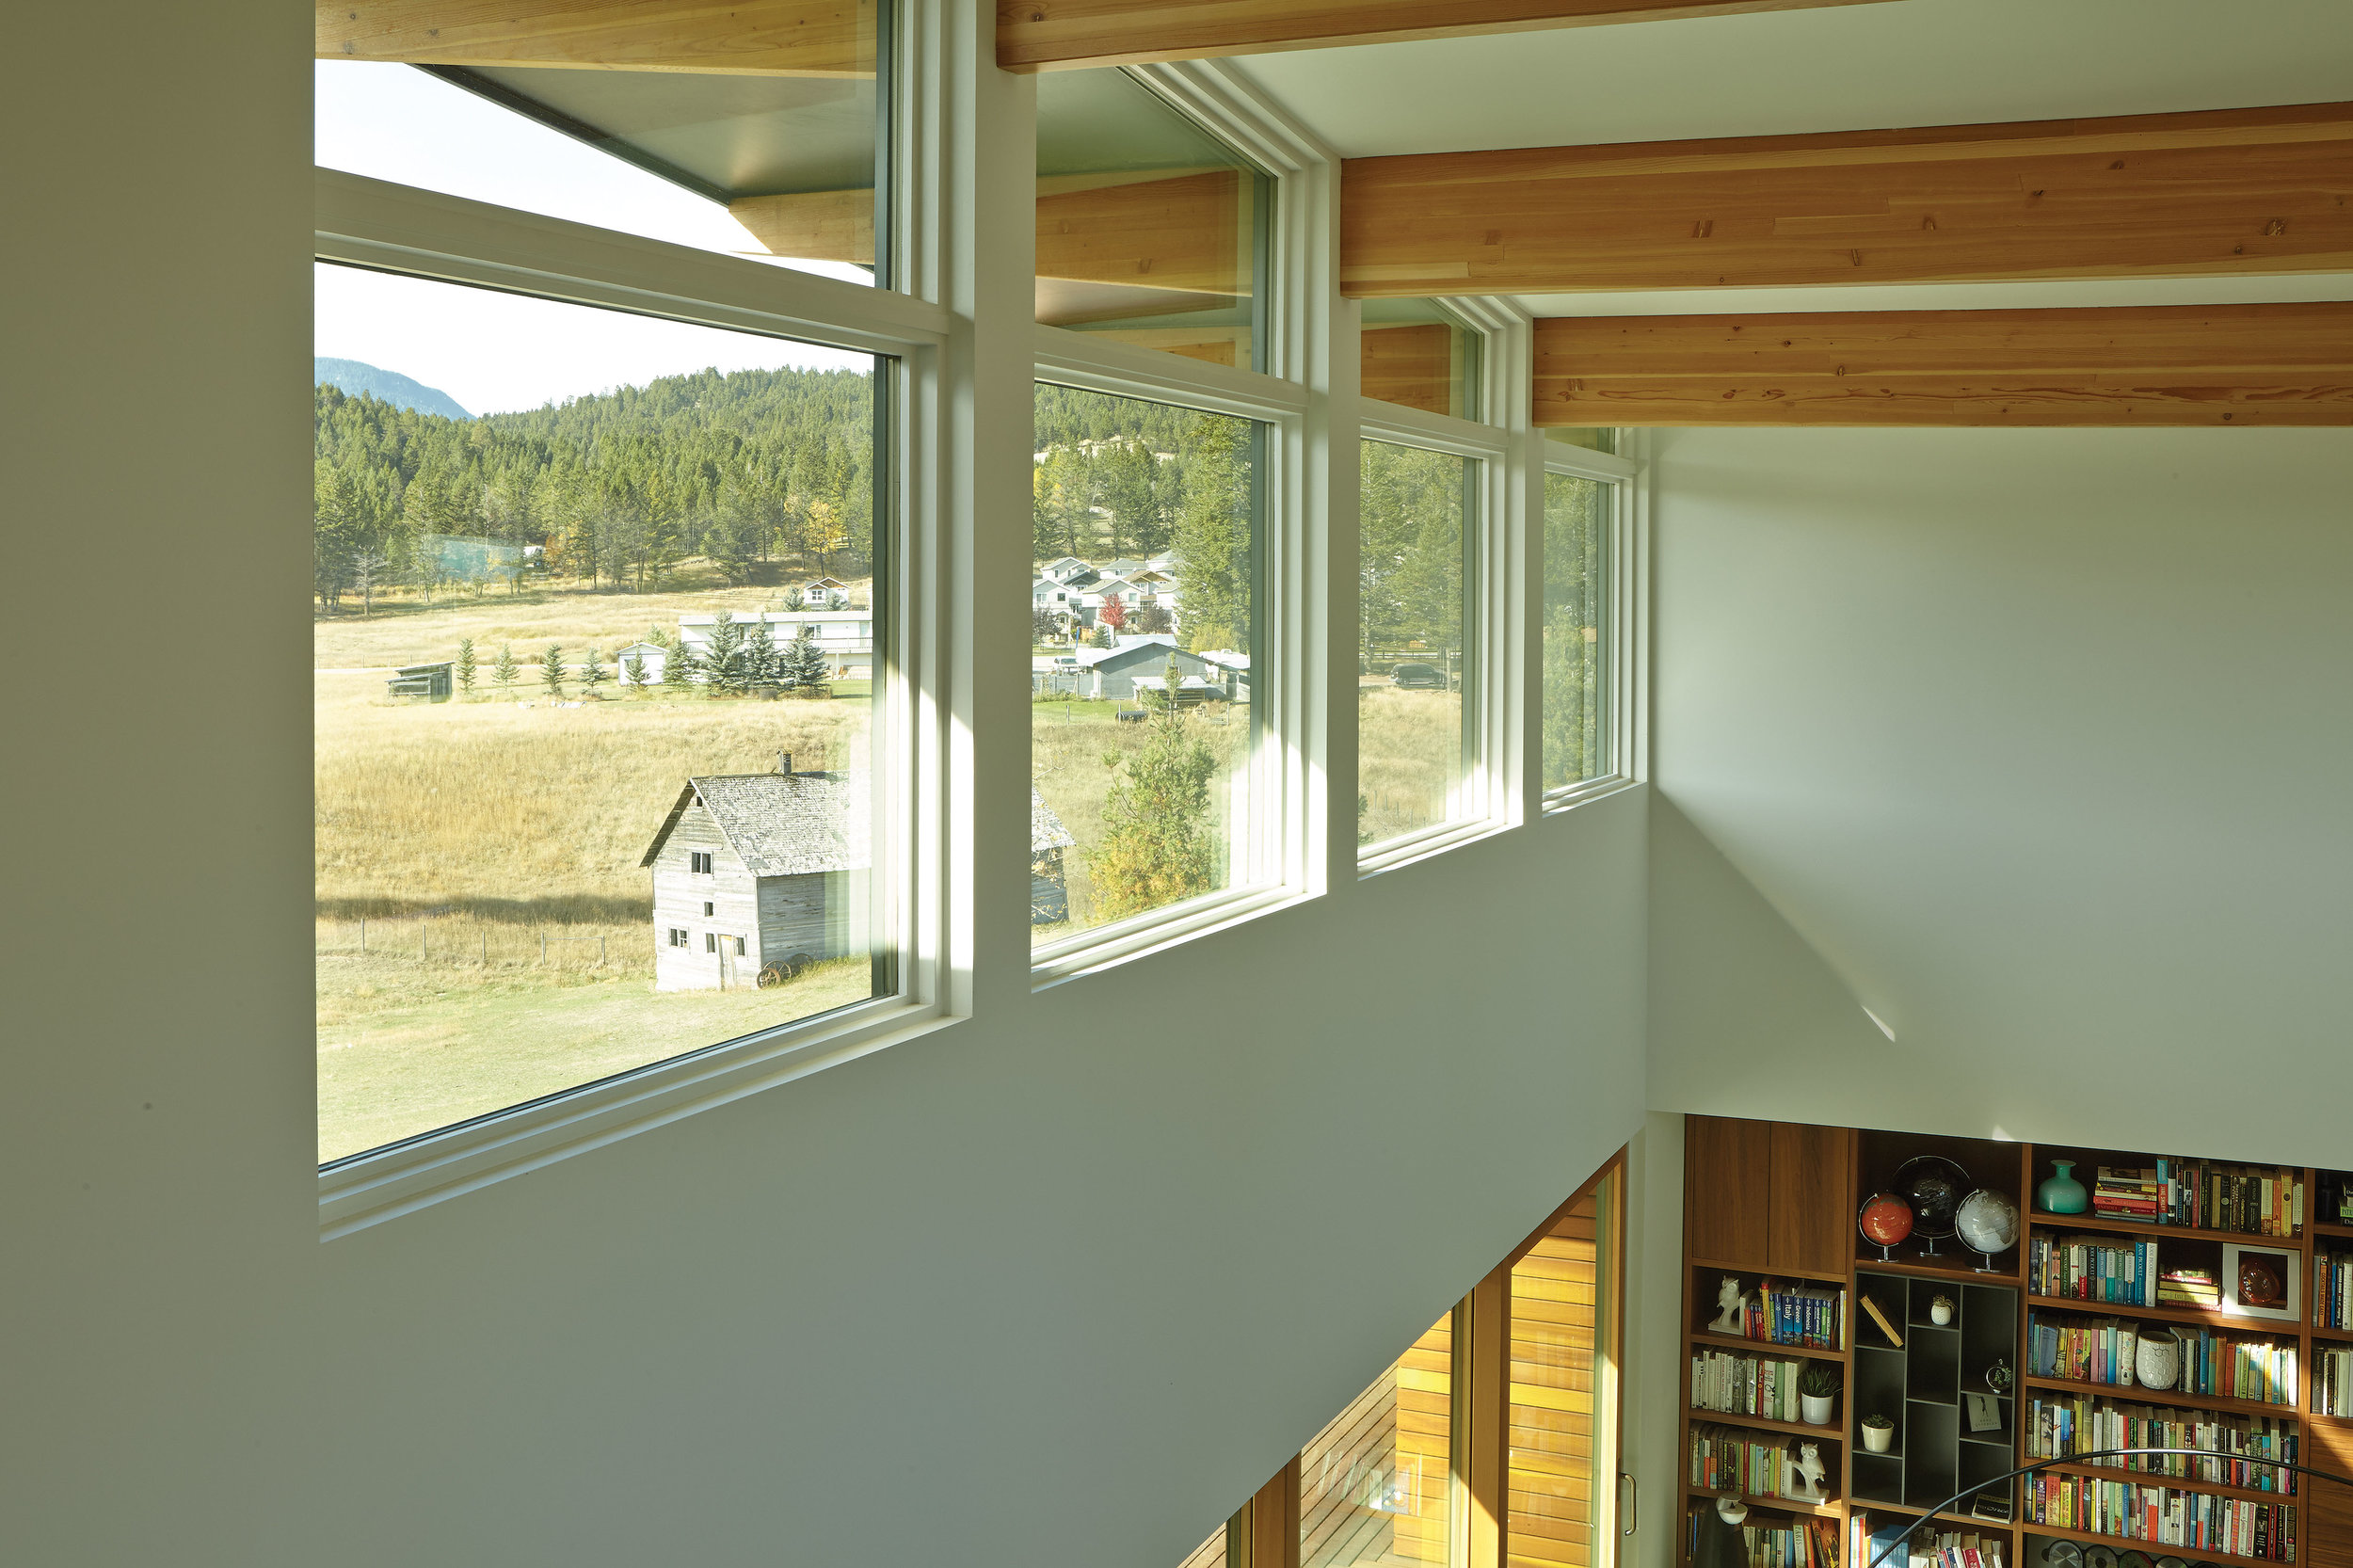 turkel_modern_design_prefab_home_windermere_britishcolumbia_windows.jpg